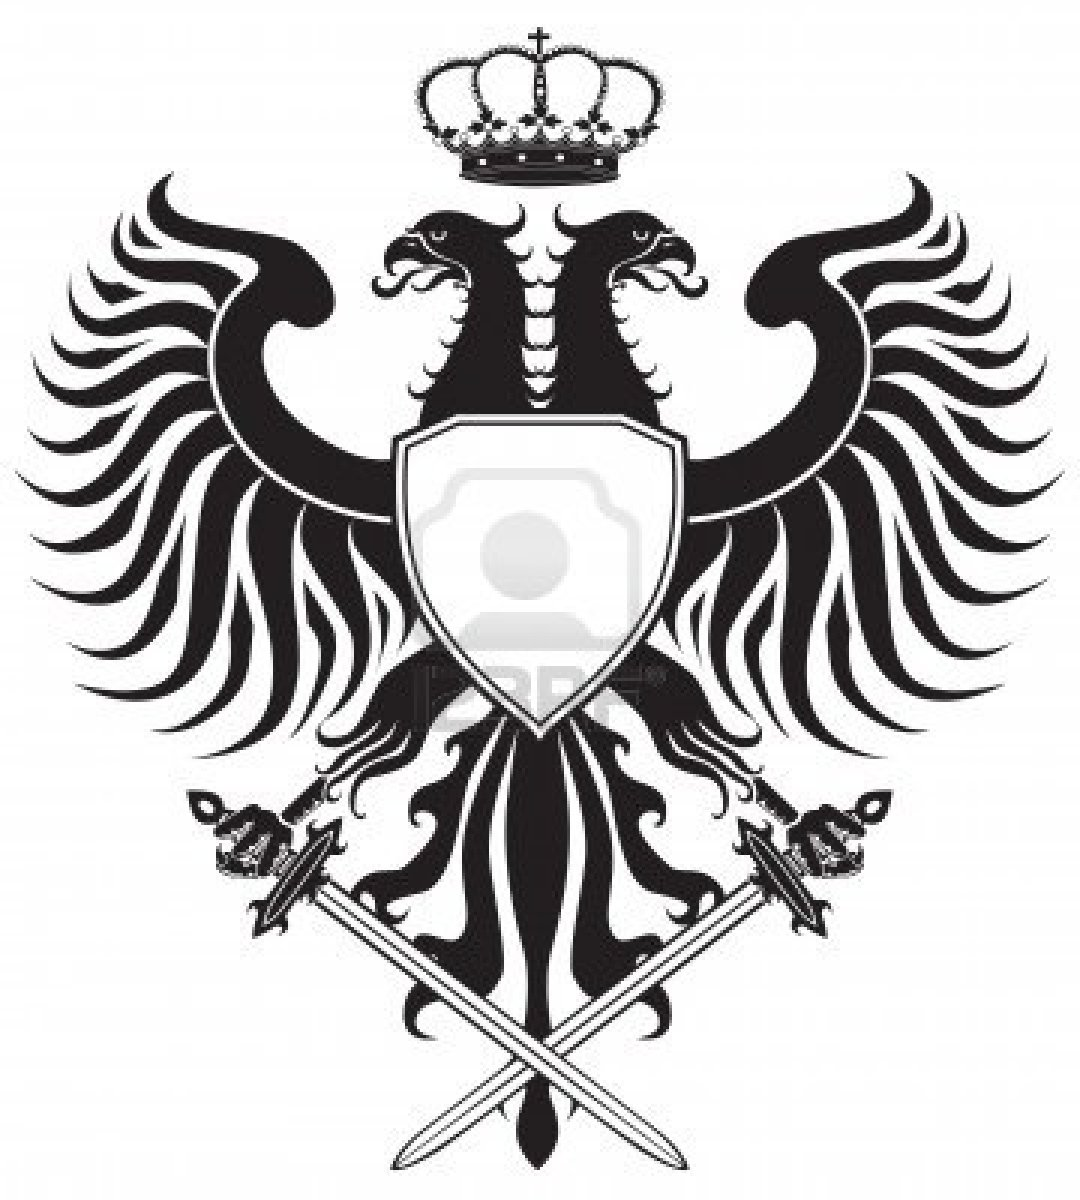 Ealge Of An Empire Image Byzantine League Mod Db